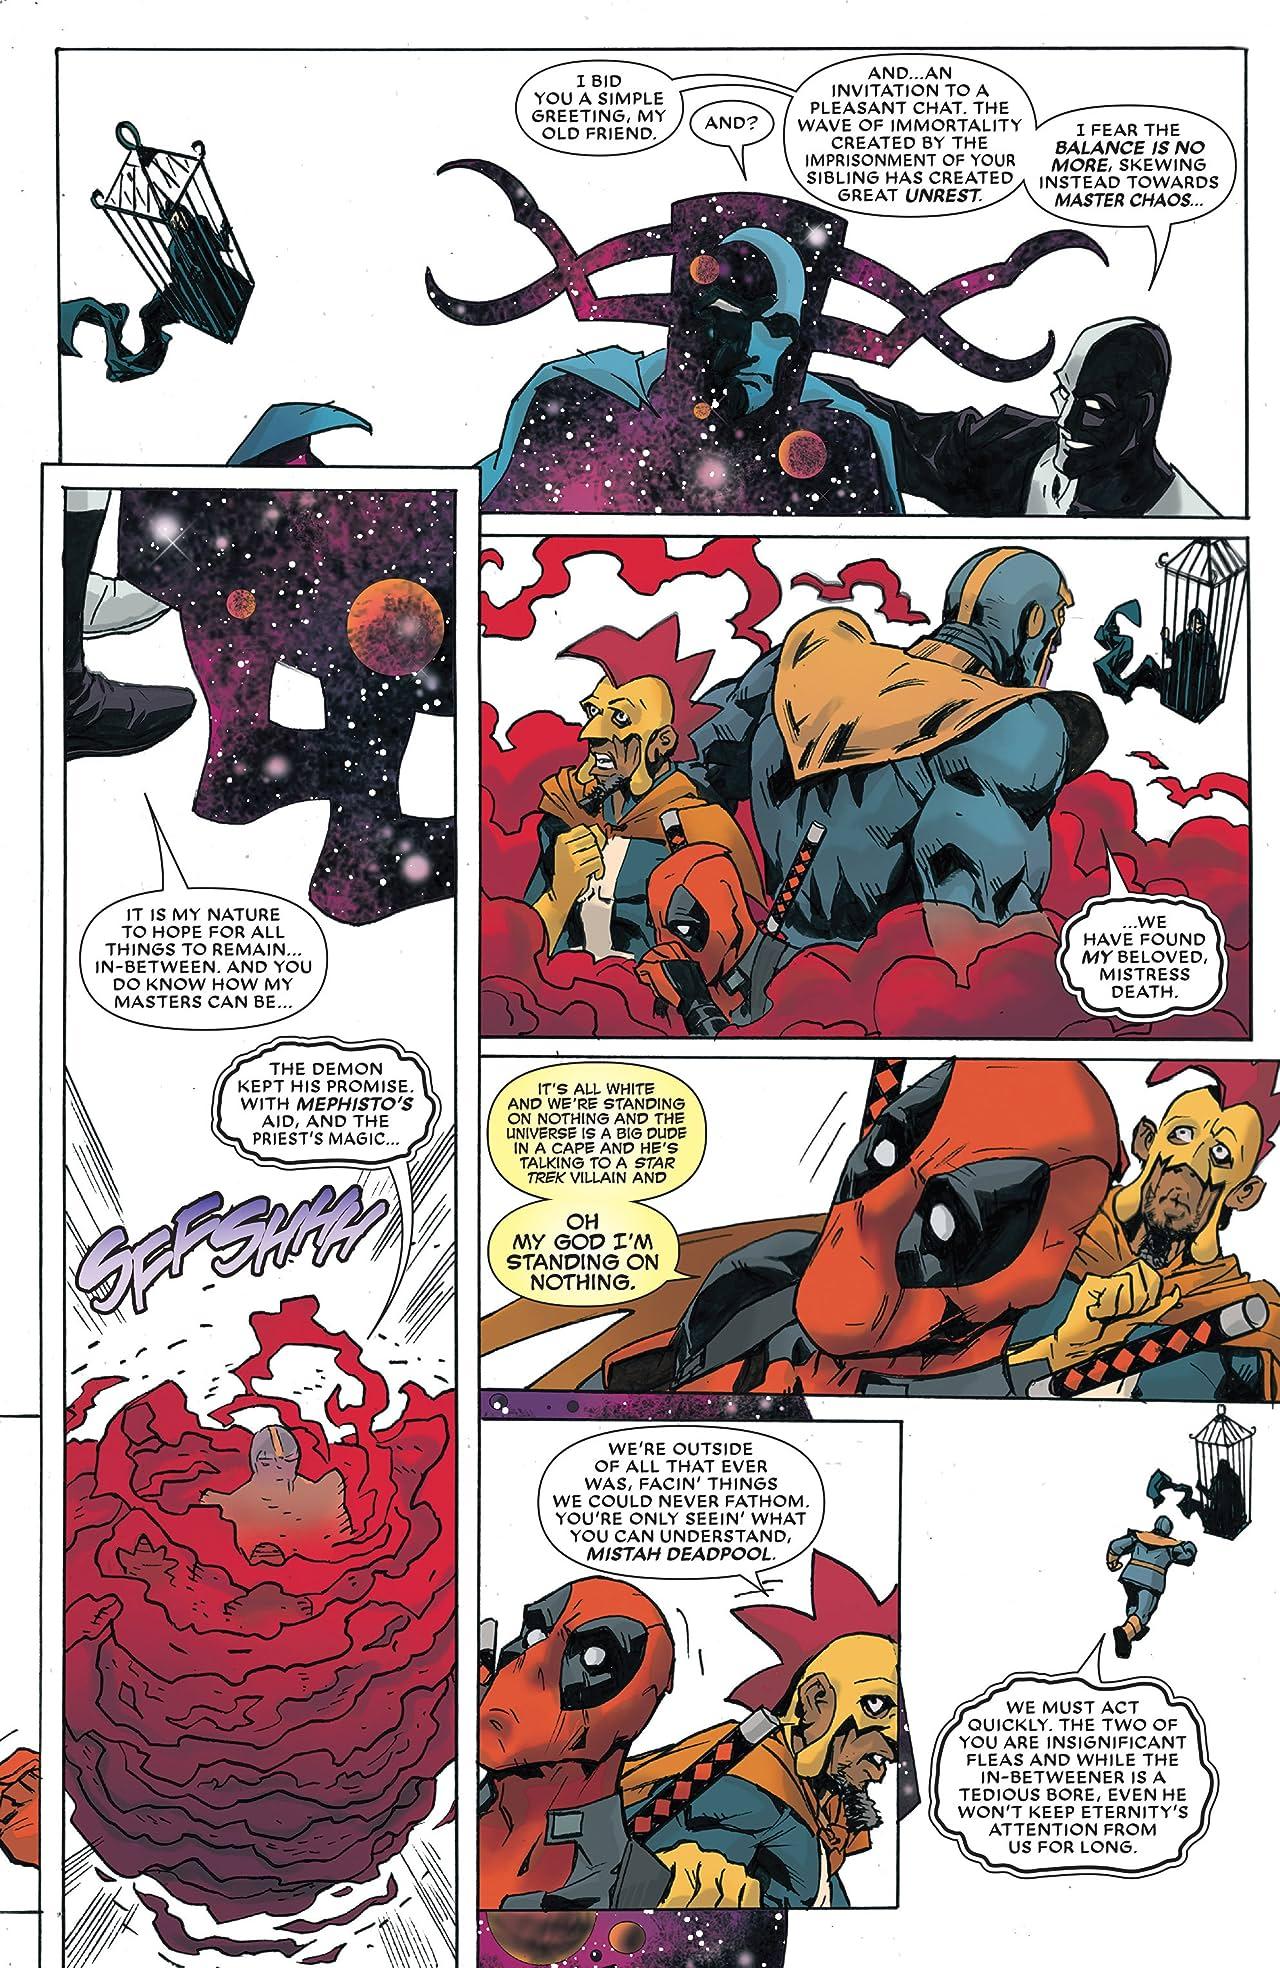 Deadpool vs. Thanos (2015) #4 (of 4)